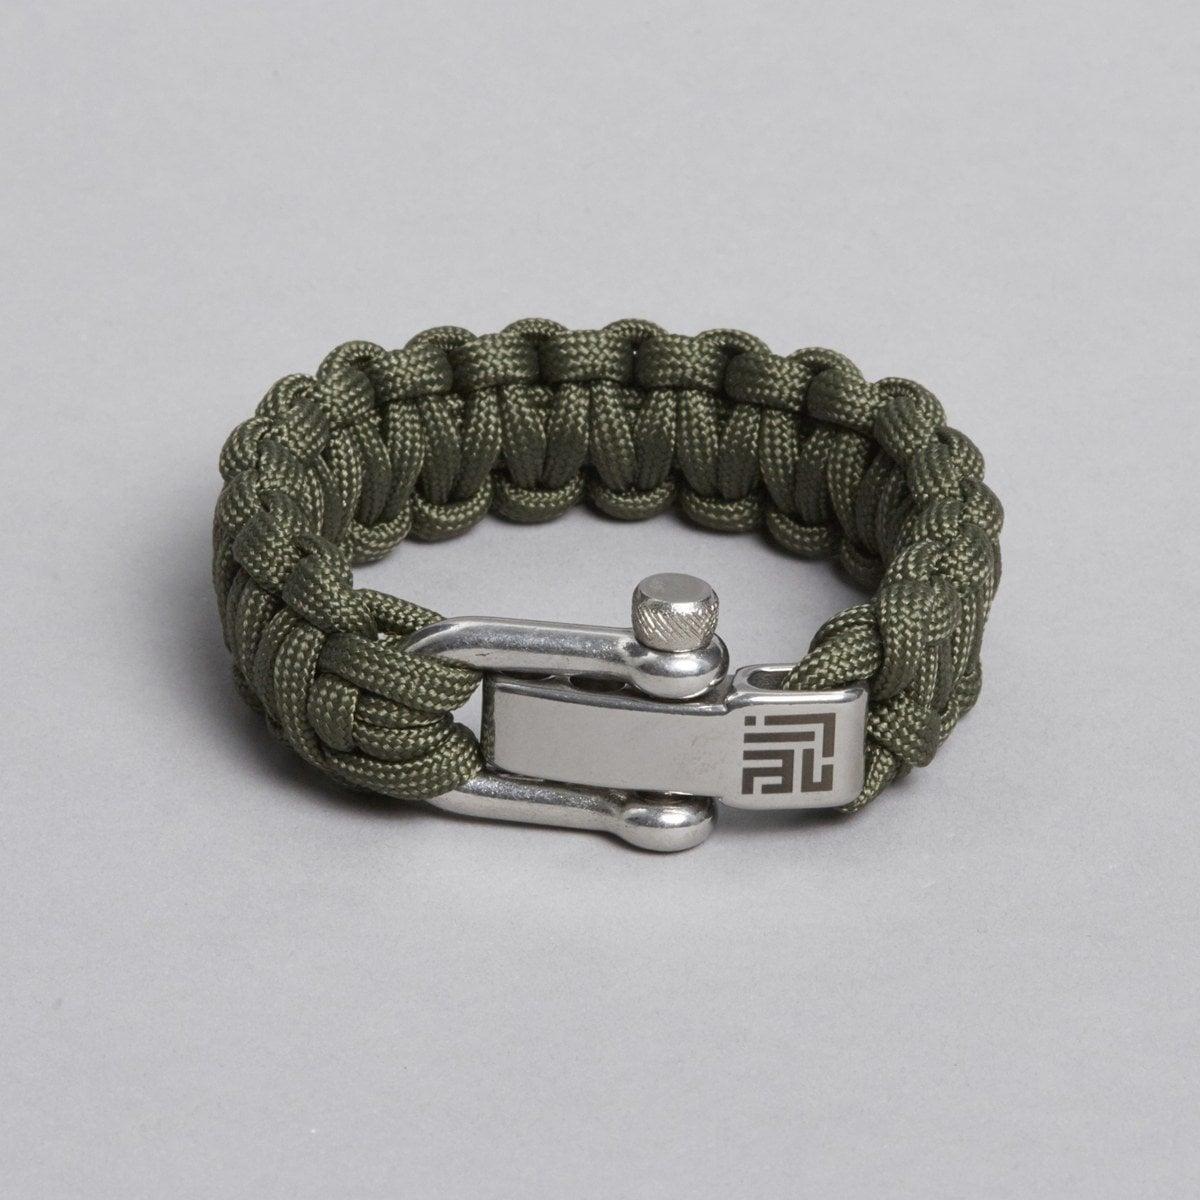 Army Paracord Bracelet Original Zlc Worldwide Delivery